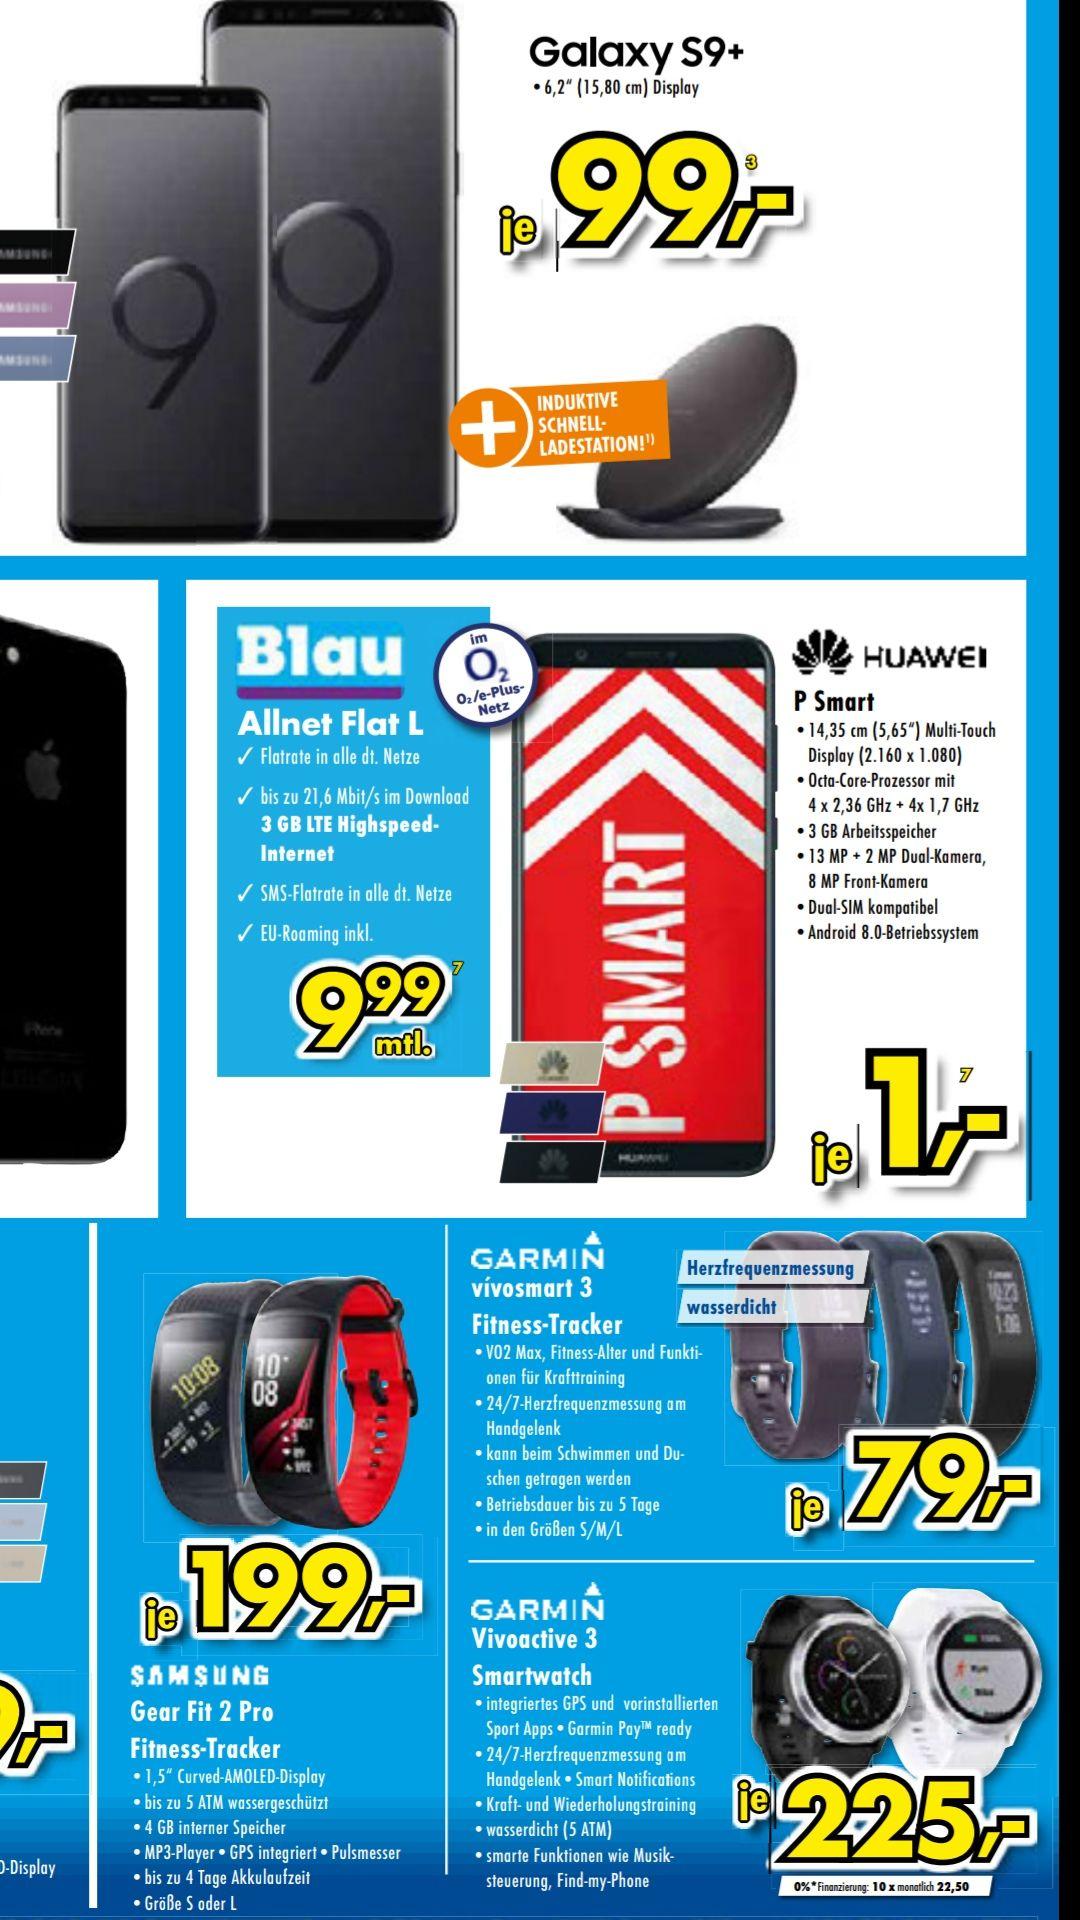 Lokal in Kamen und Menden: Huawei P Smart mit Blau Allnet L 9,99 Eur / Monat